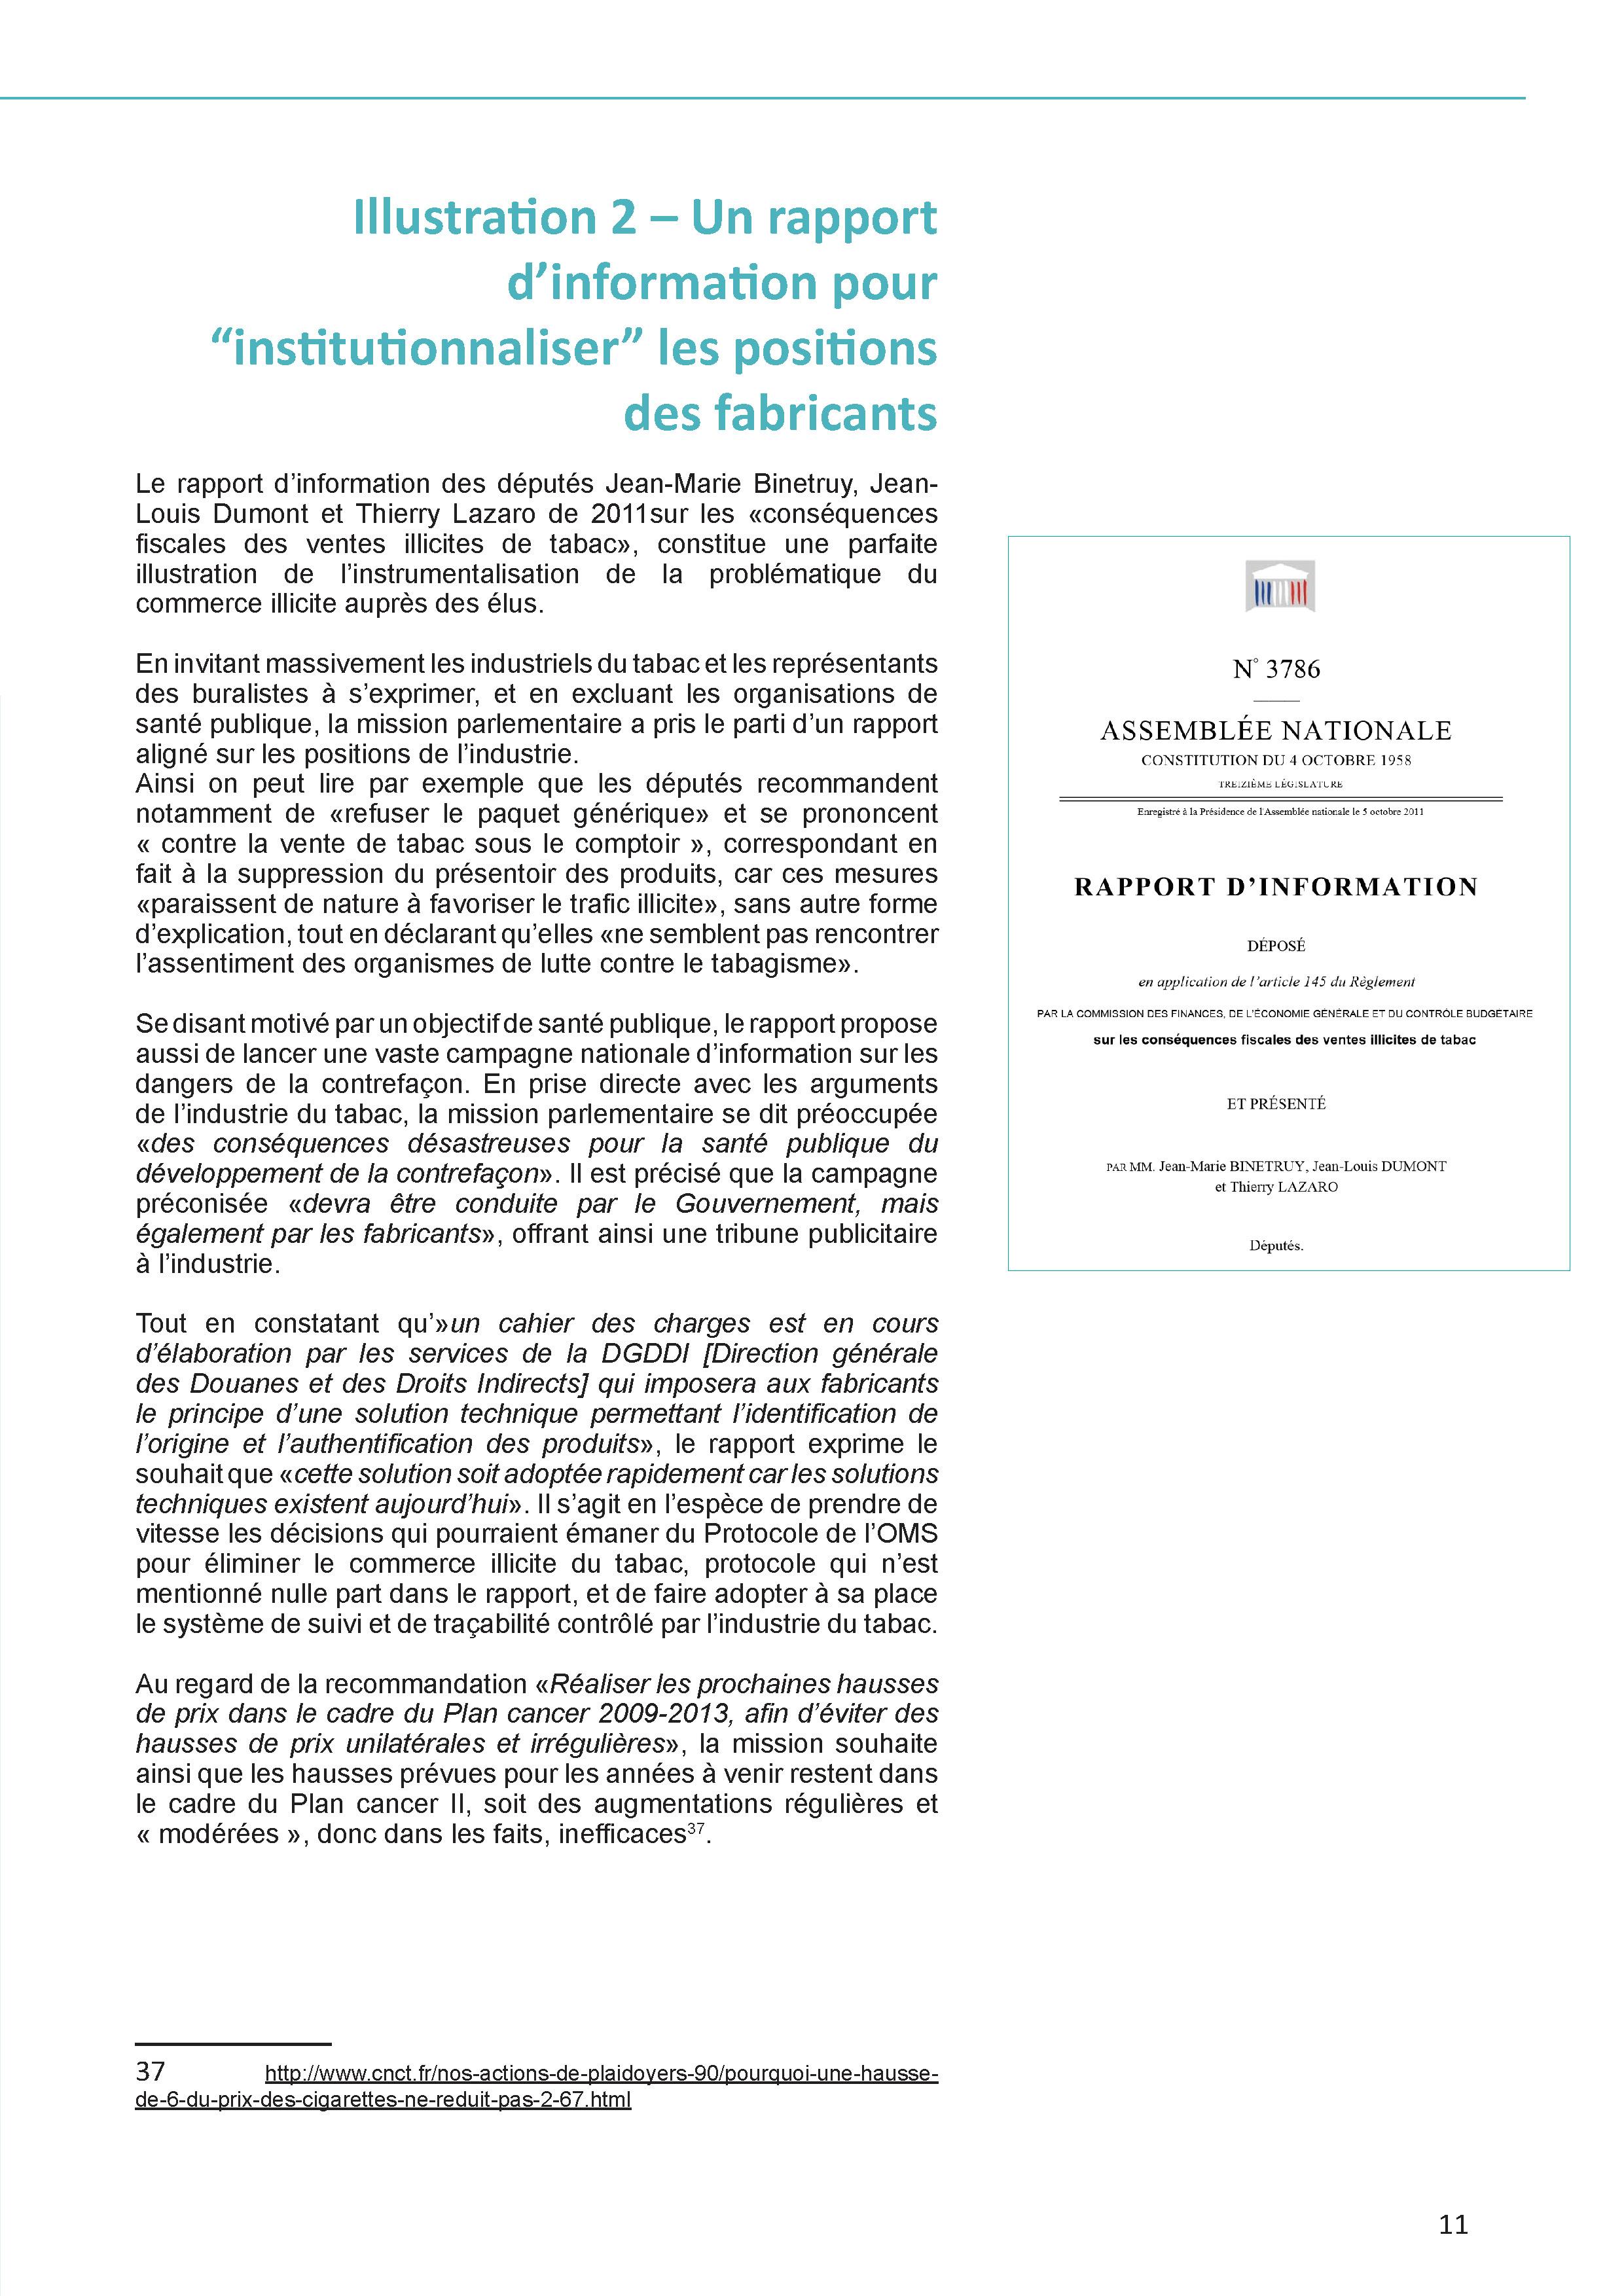 Alliance-DP_commerce-illicite-26mai2015_Page_11.jpg